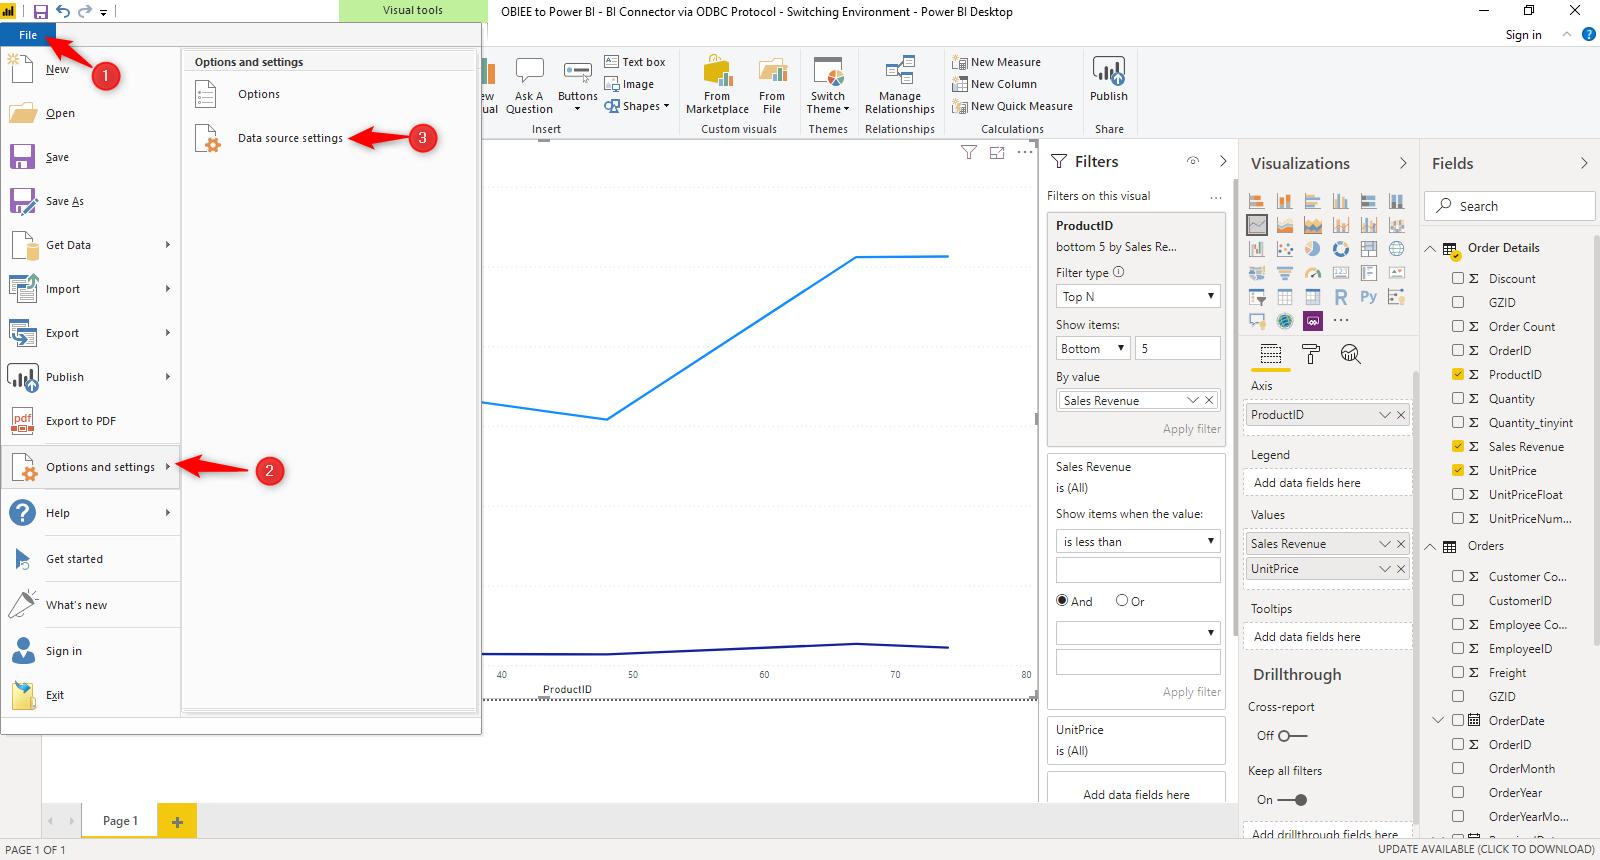 File Options and settings Data Source Settings Navigation Power BI